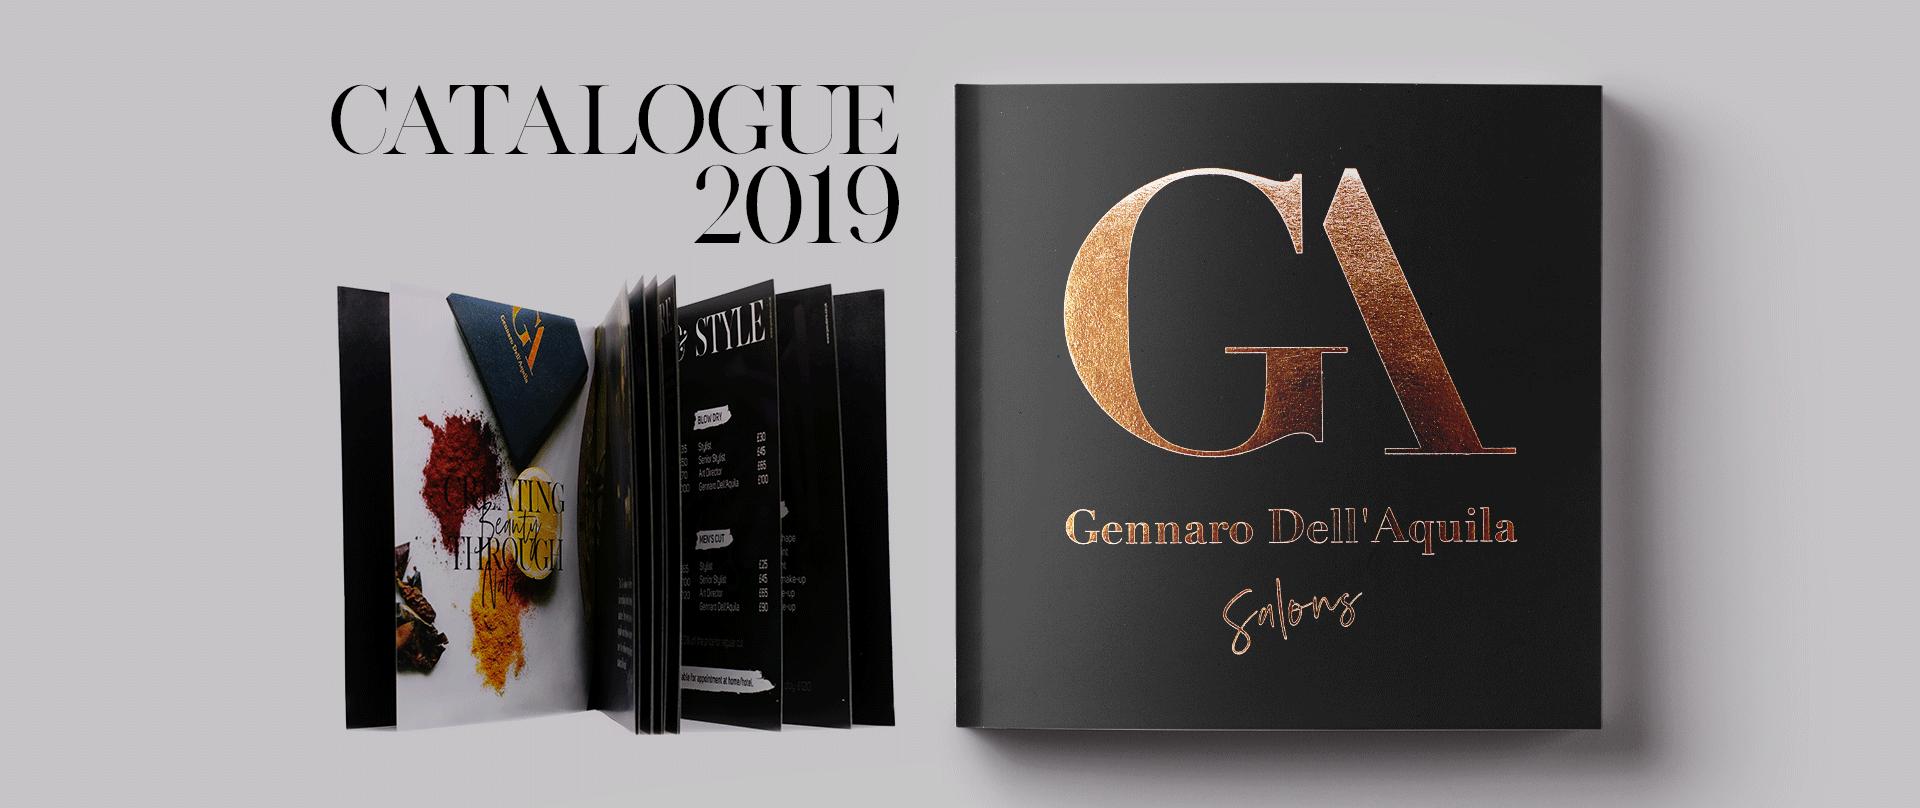 фризьорски салон дизайн, каталог, лого, фолио Muse Creativity